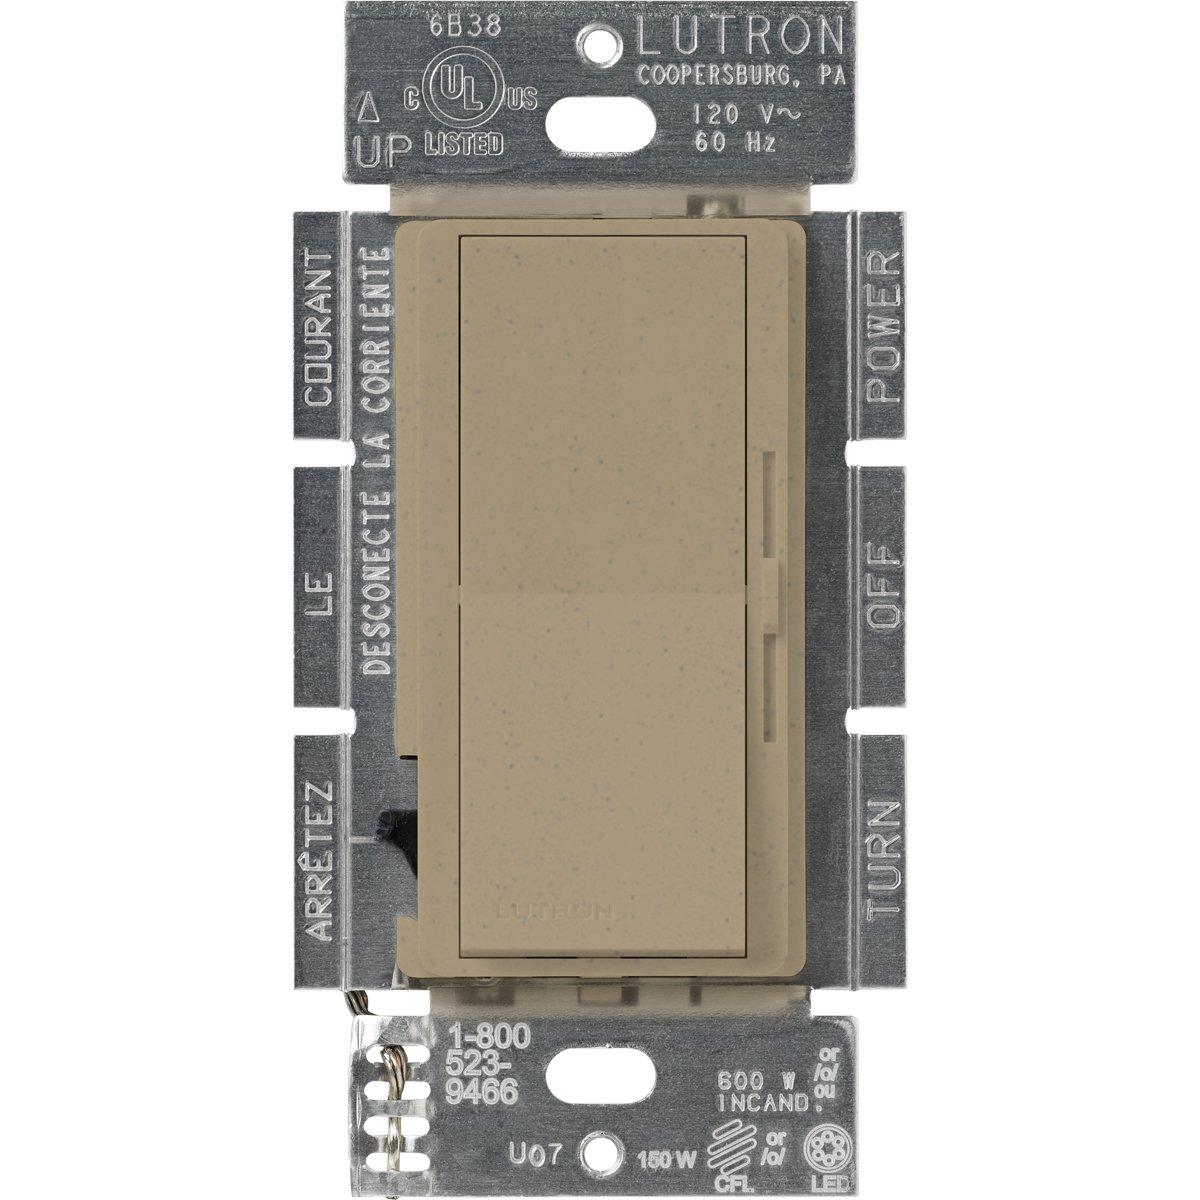 Lutron DVSCCL-153P-MS Diva Dimmable CFL/LED Dimmer, Mocha Stone